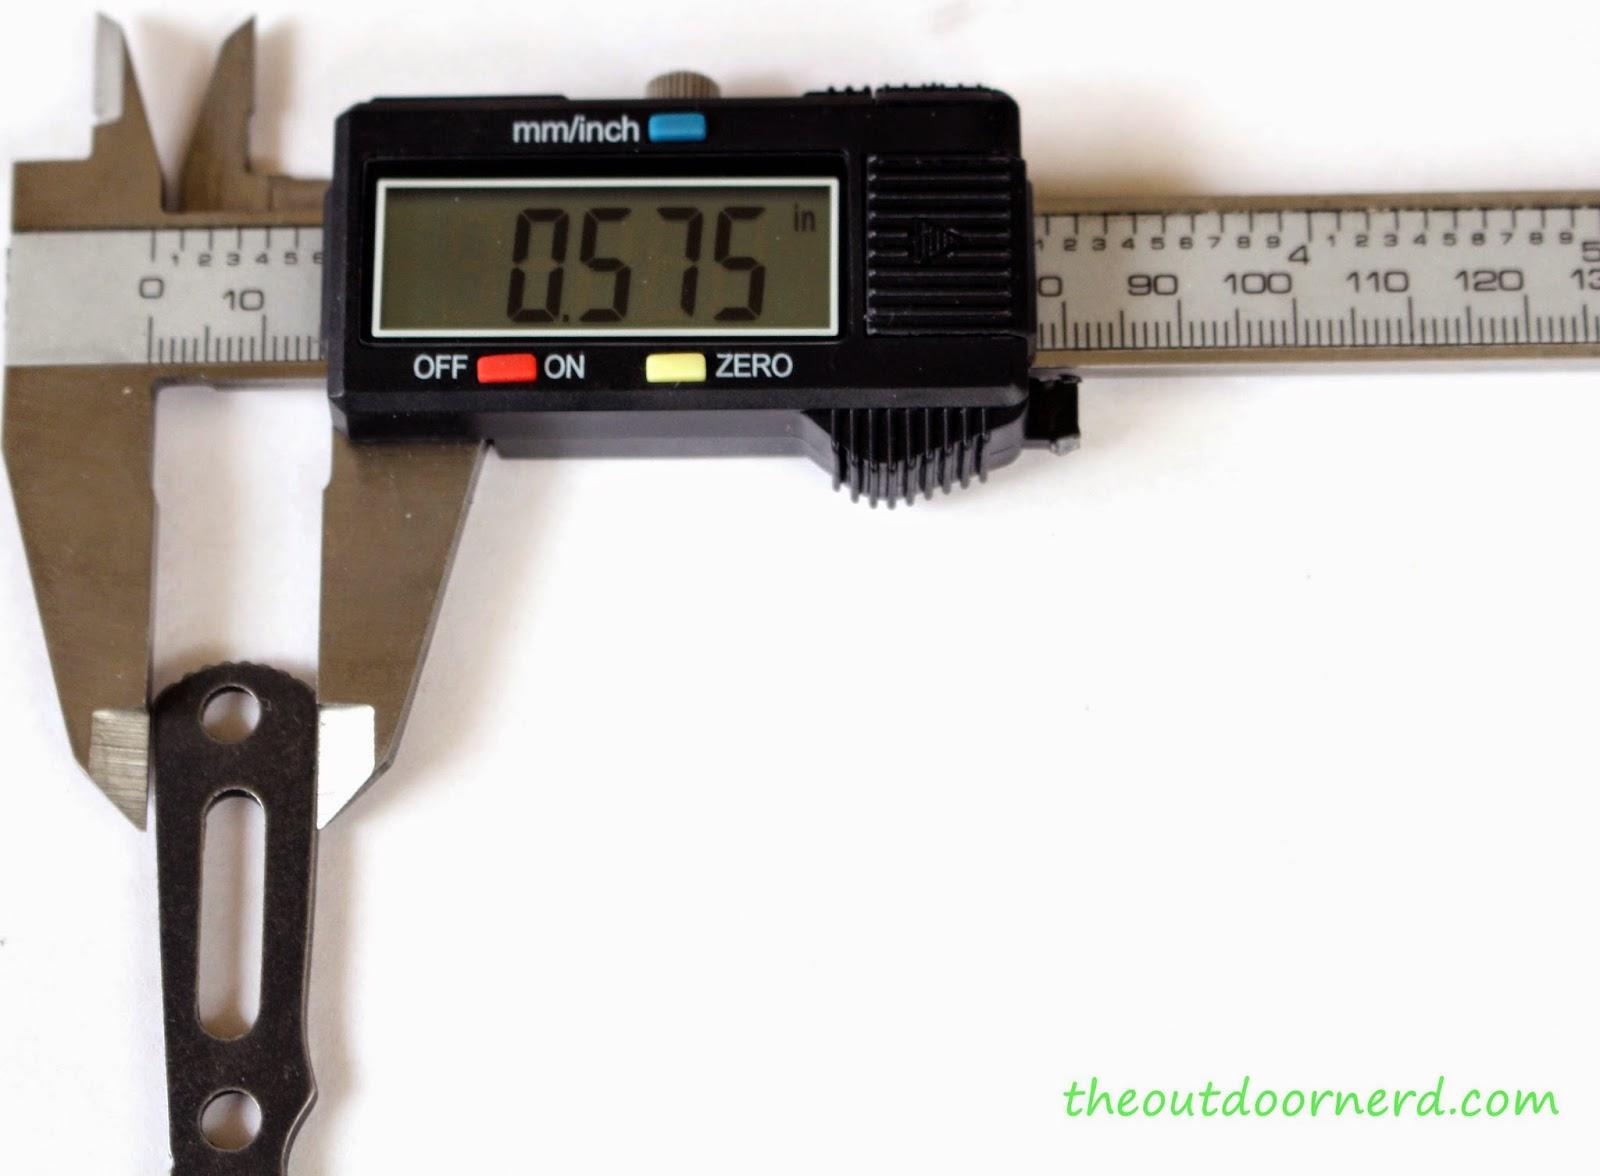 Boker Magnum 'Lil Friend' Arrowhead: Caliper Measurement 3